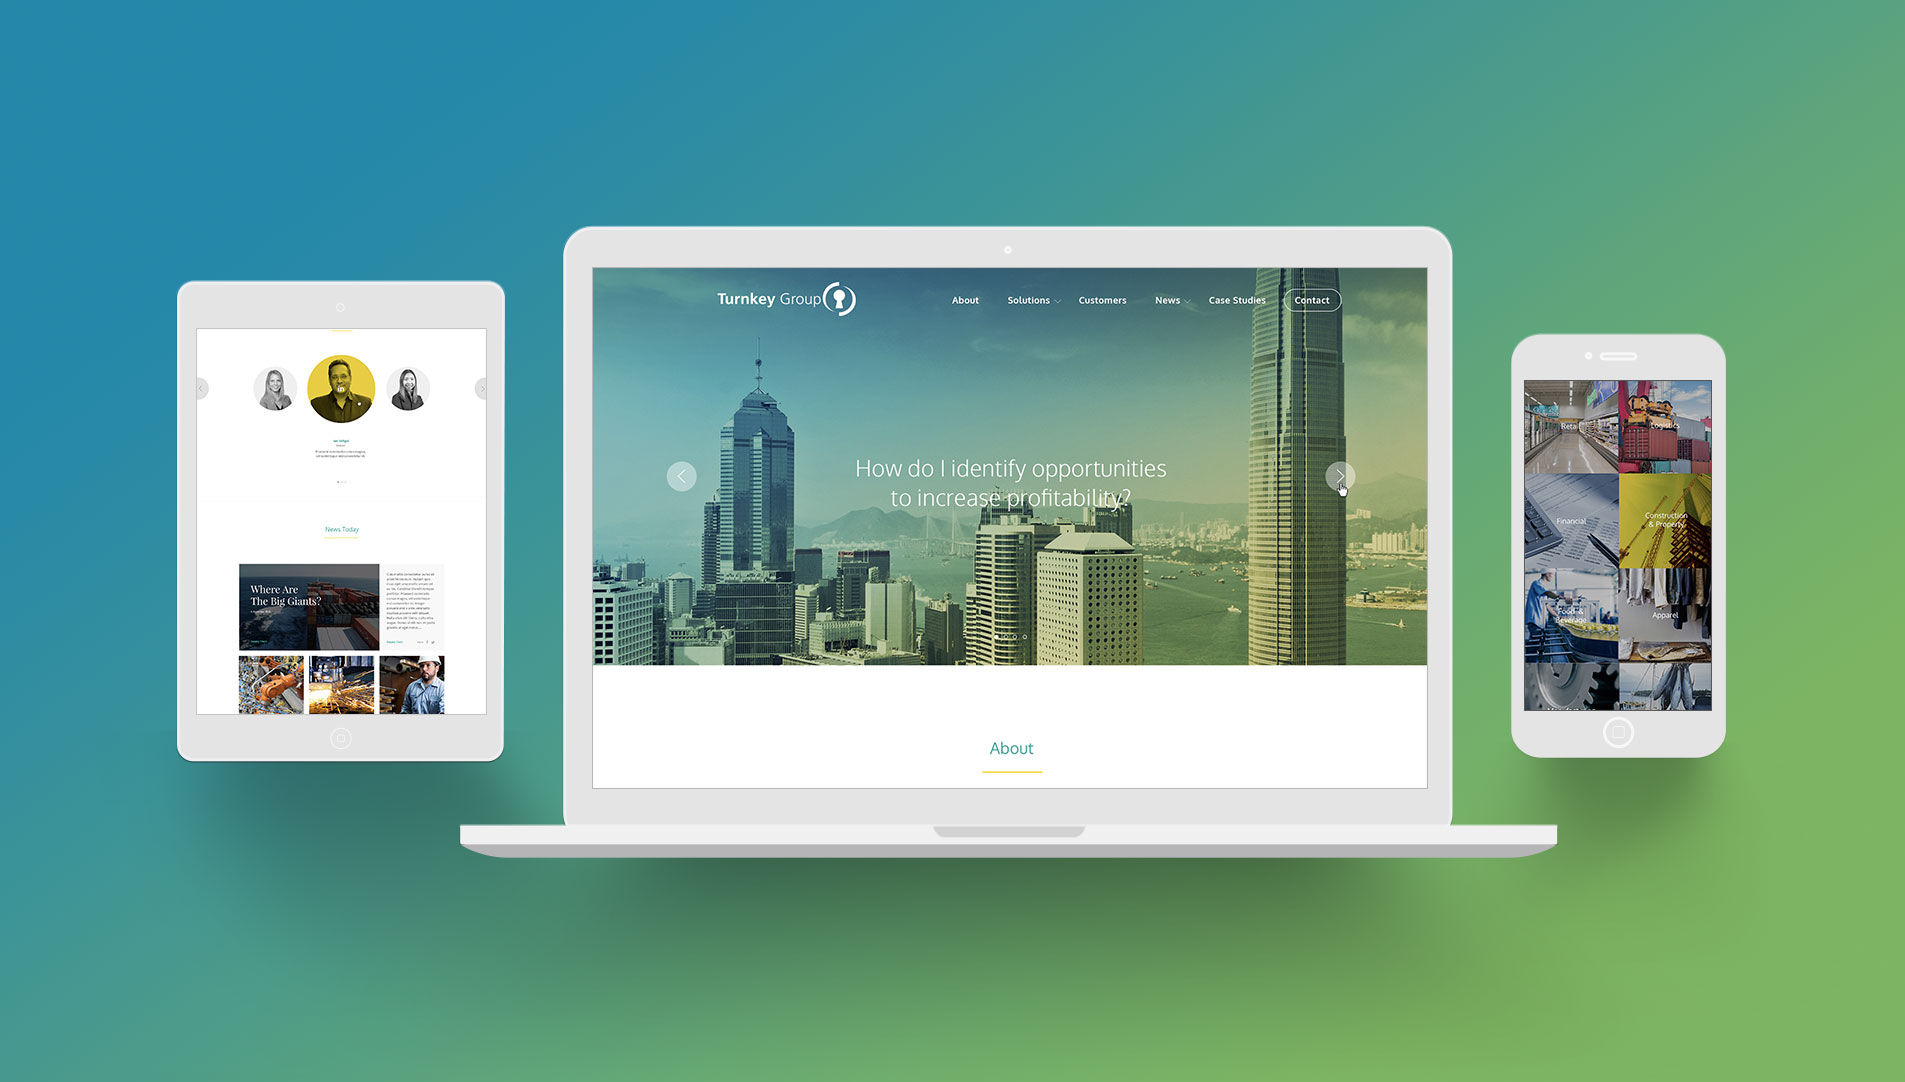 web design hk turnkey slideshow 00